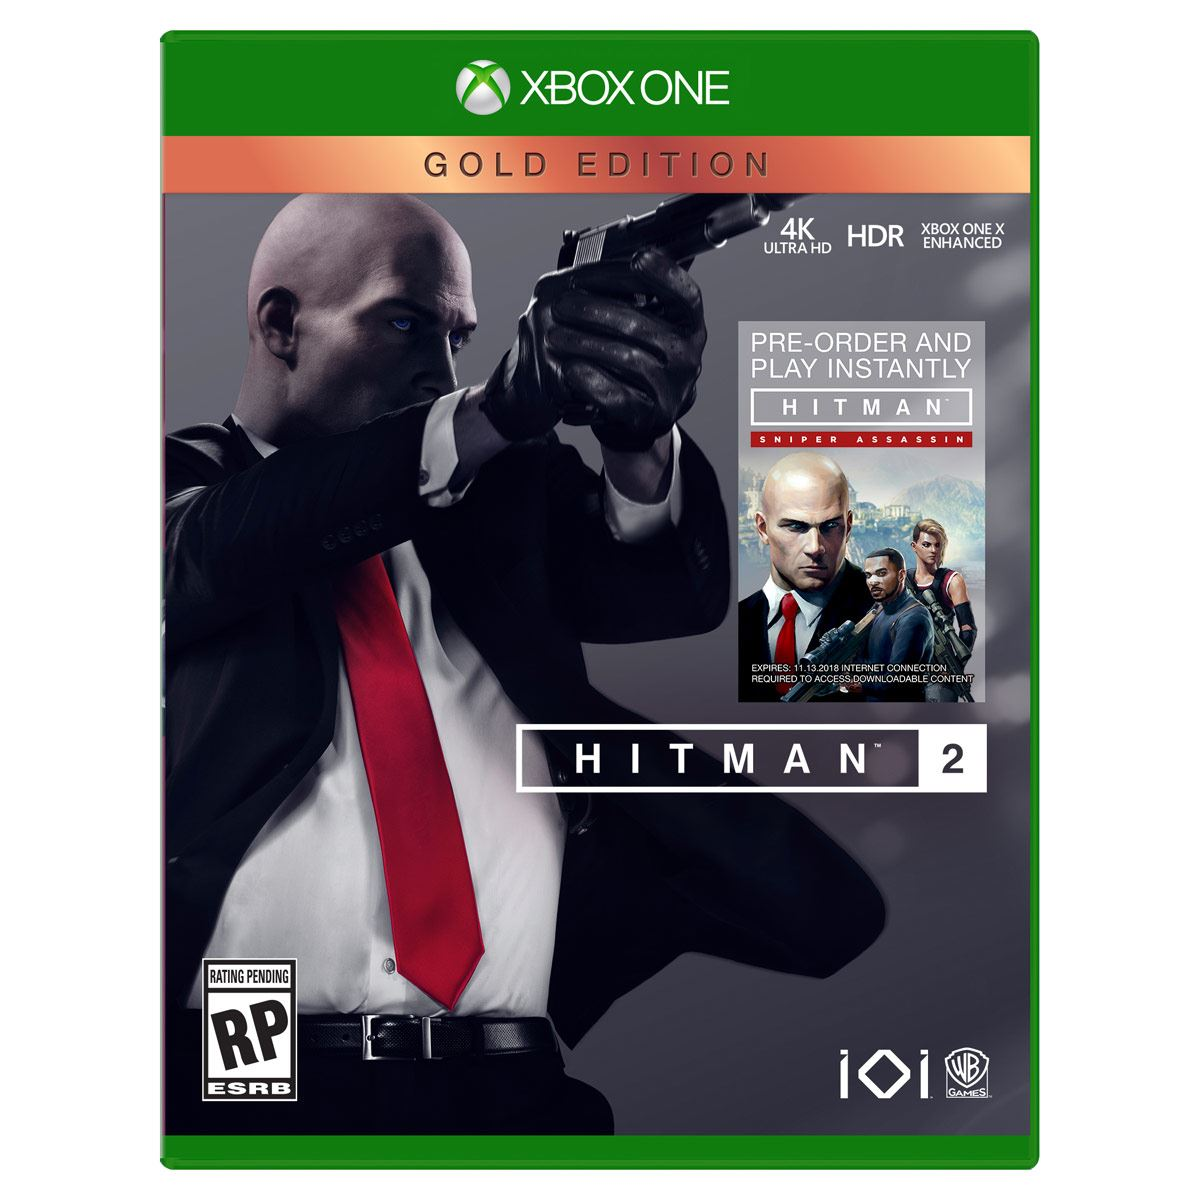 Xbox One Hitman 2 Gold Edition